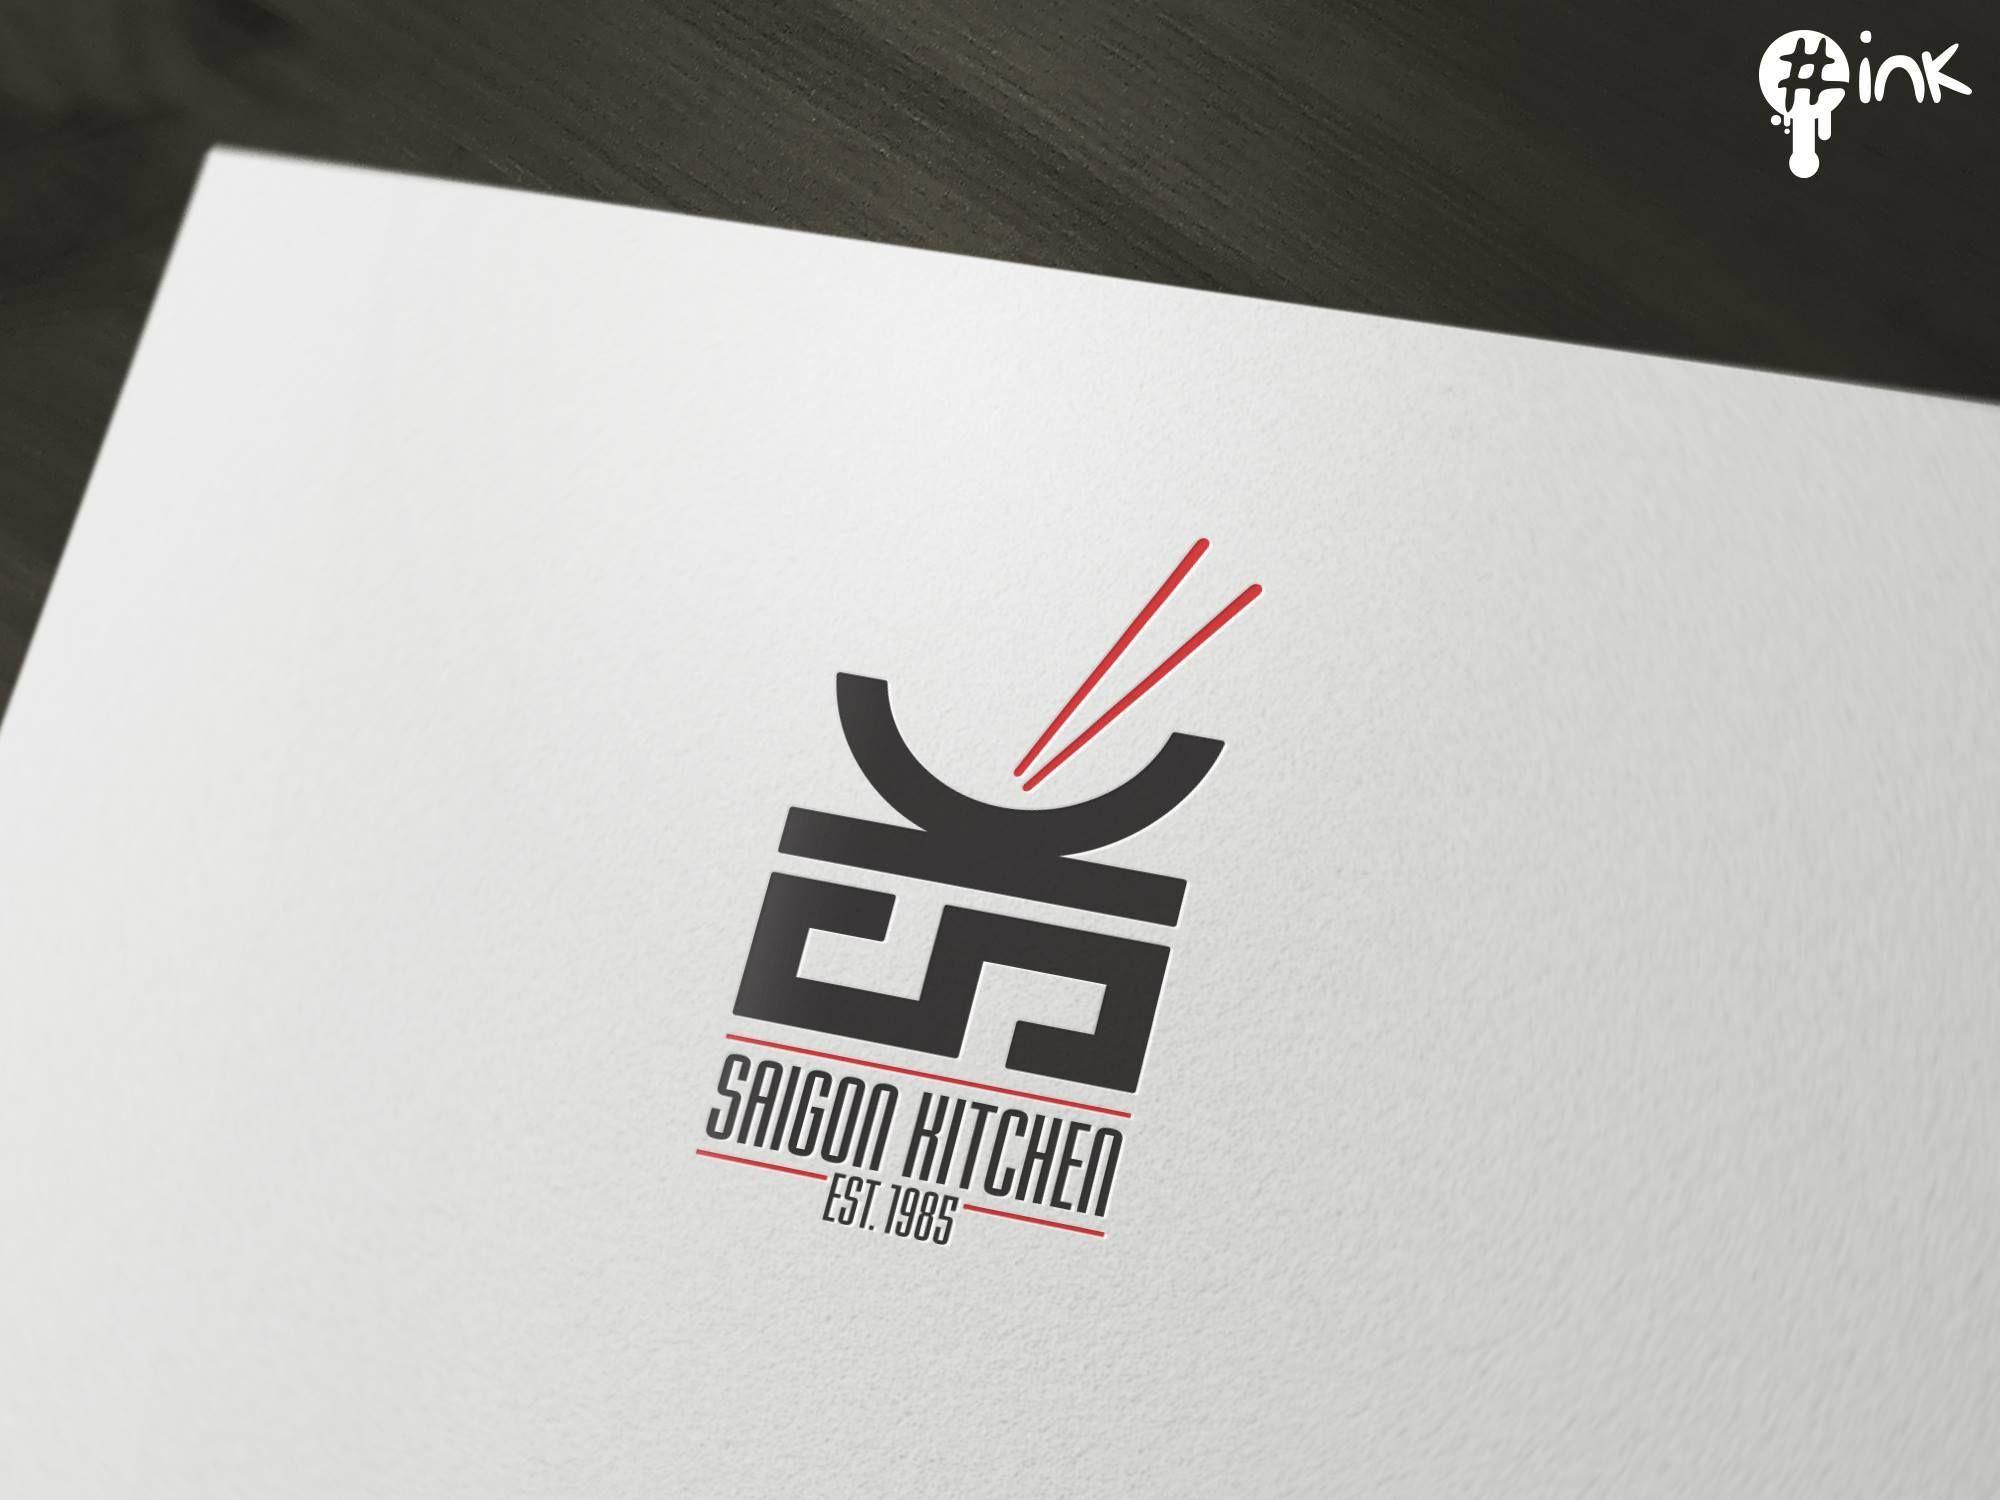 Kitchen Logo Design Ideas ~ Pics for gt kitchen logo ideas